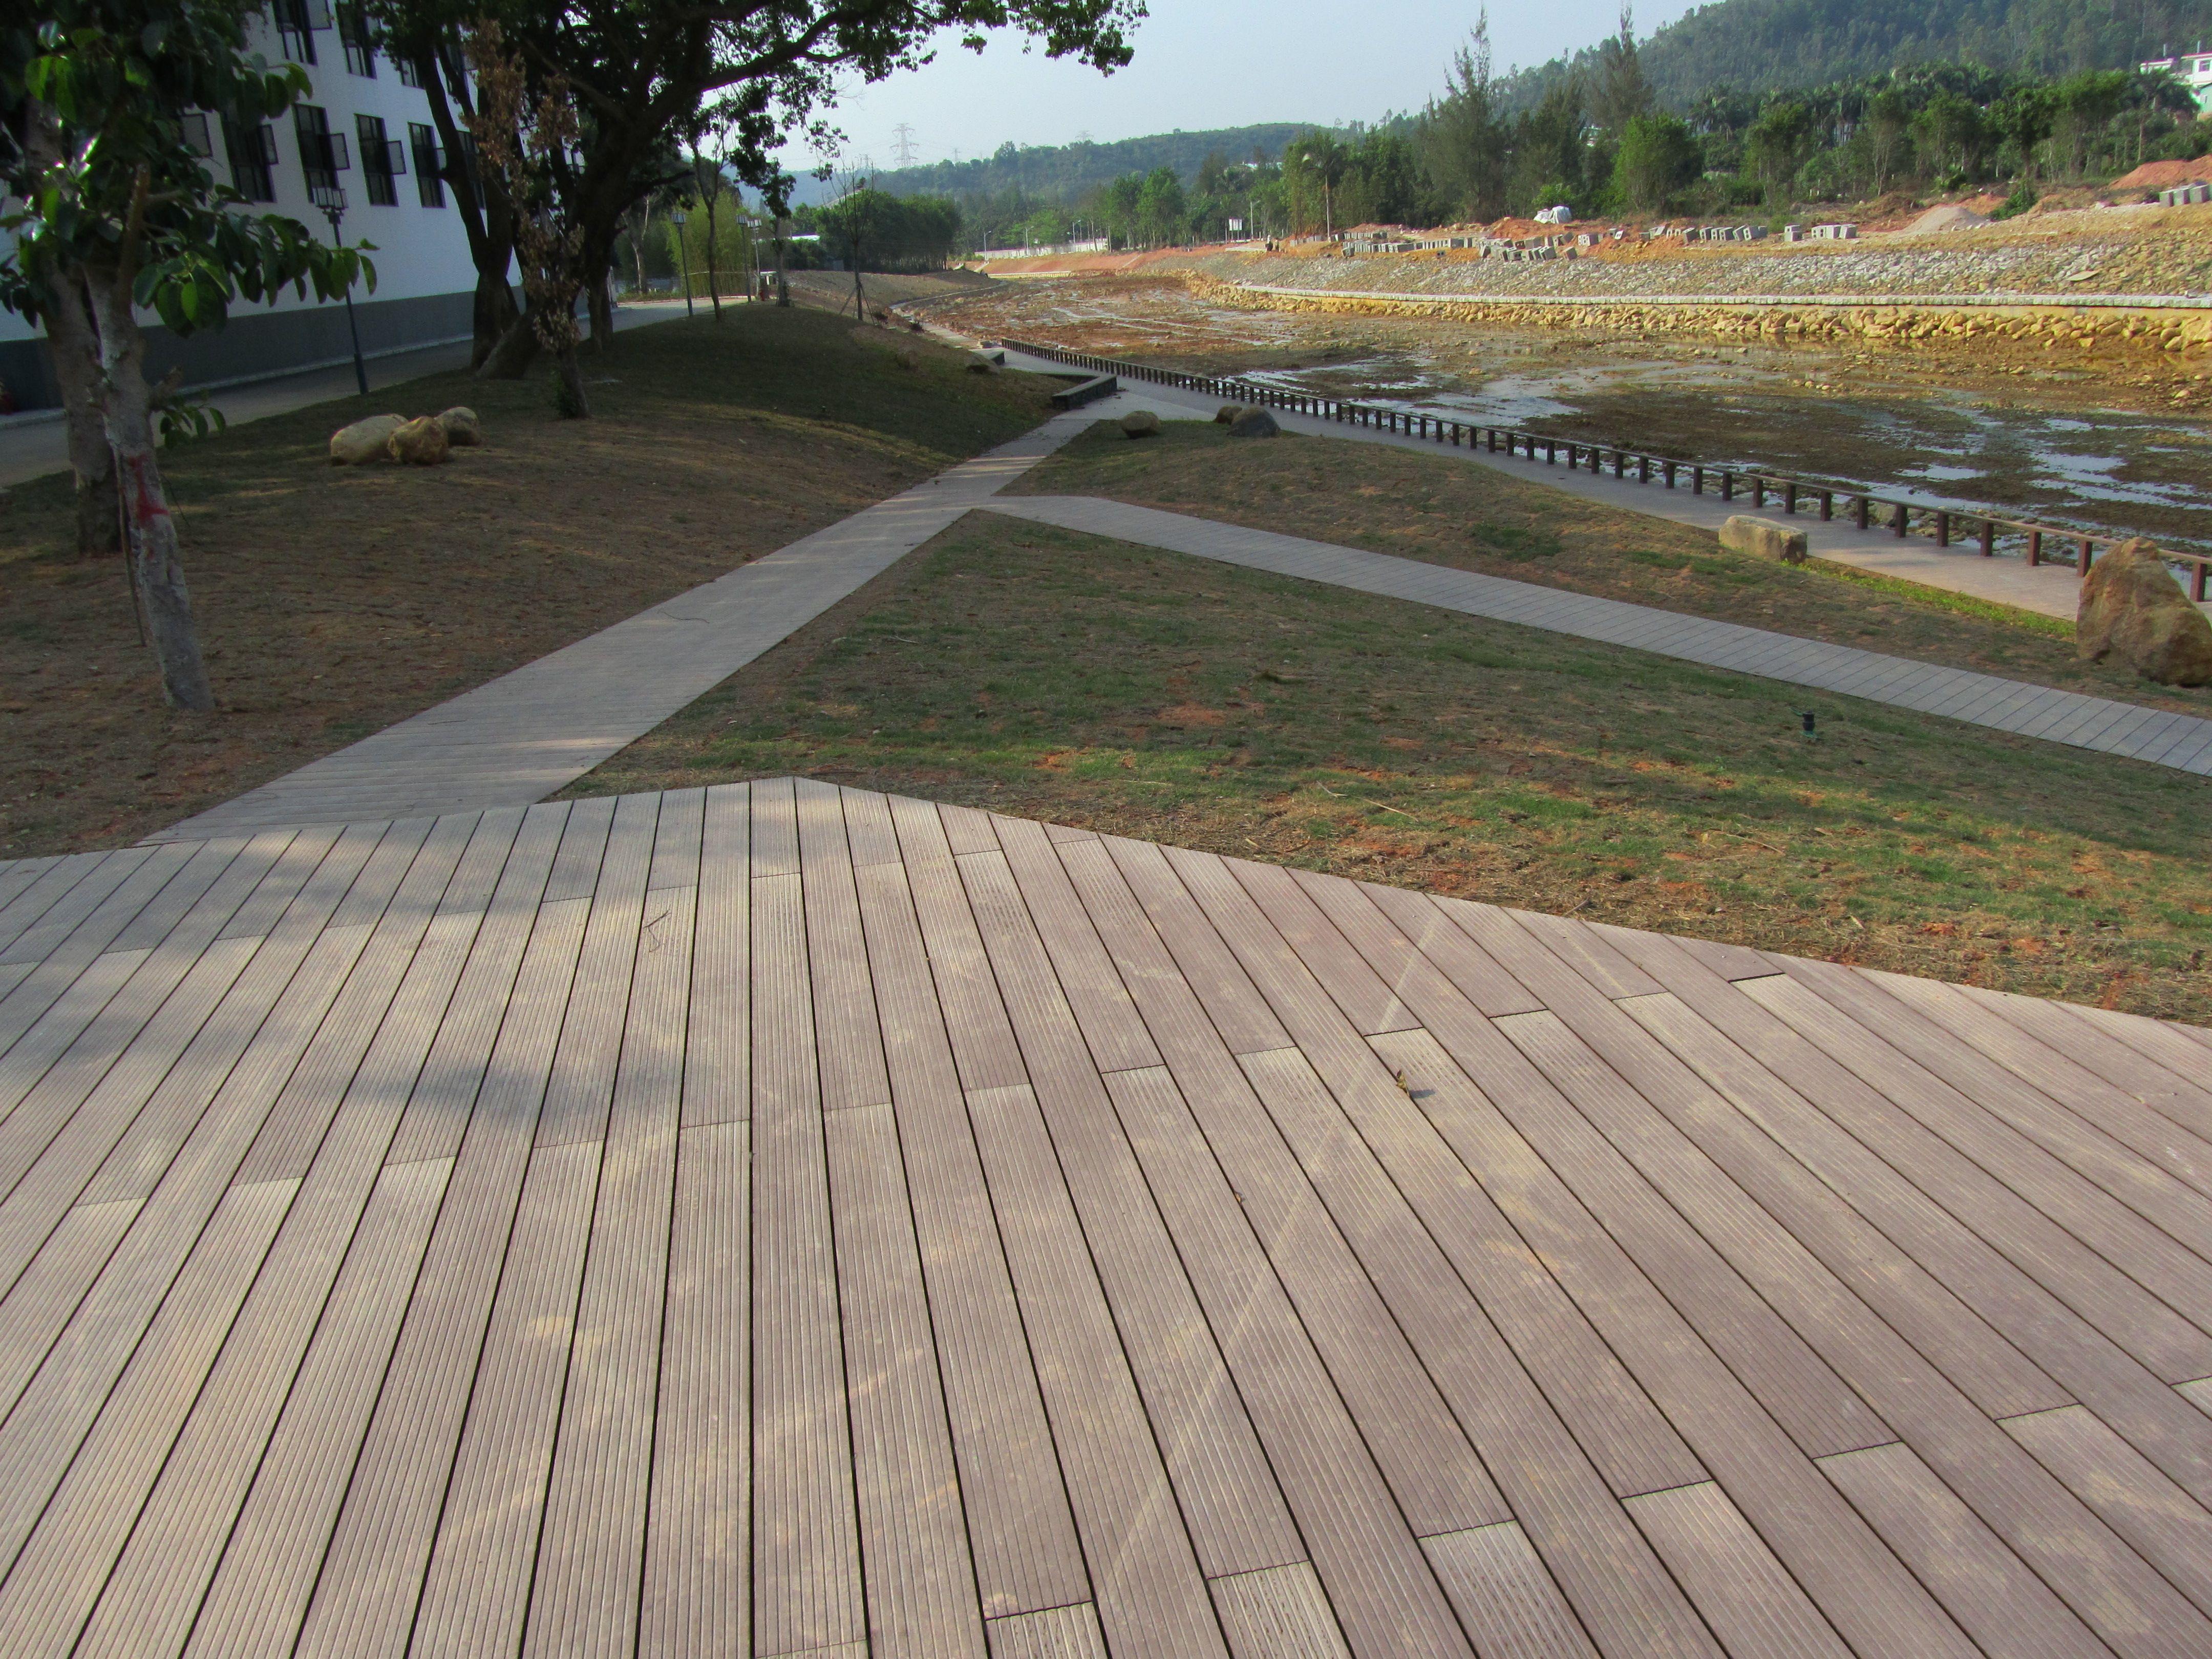 Temporary Outdoor Flooring To Cover Dirt Outdoor Laminate Flooring